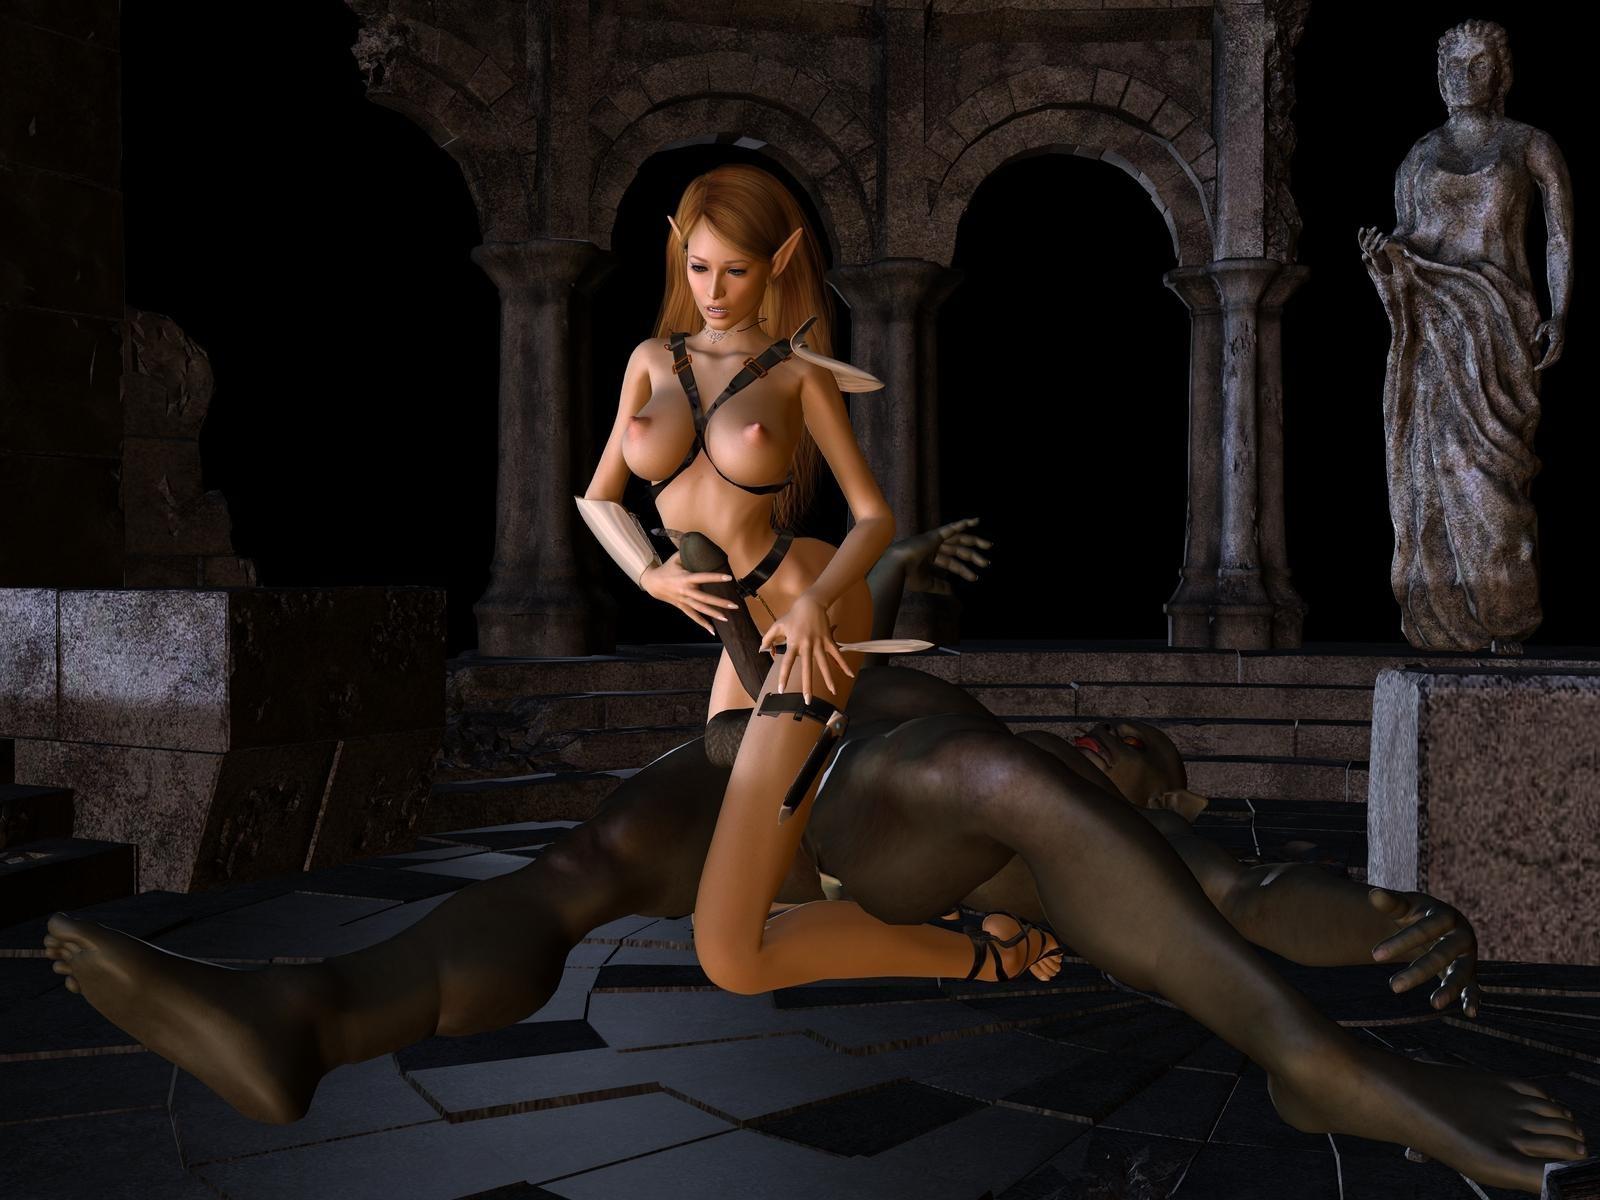 Monster fuks elf abus porn adult galleries